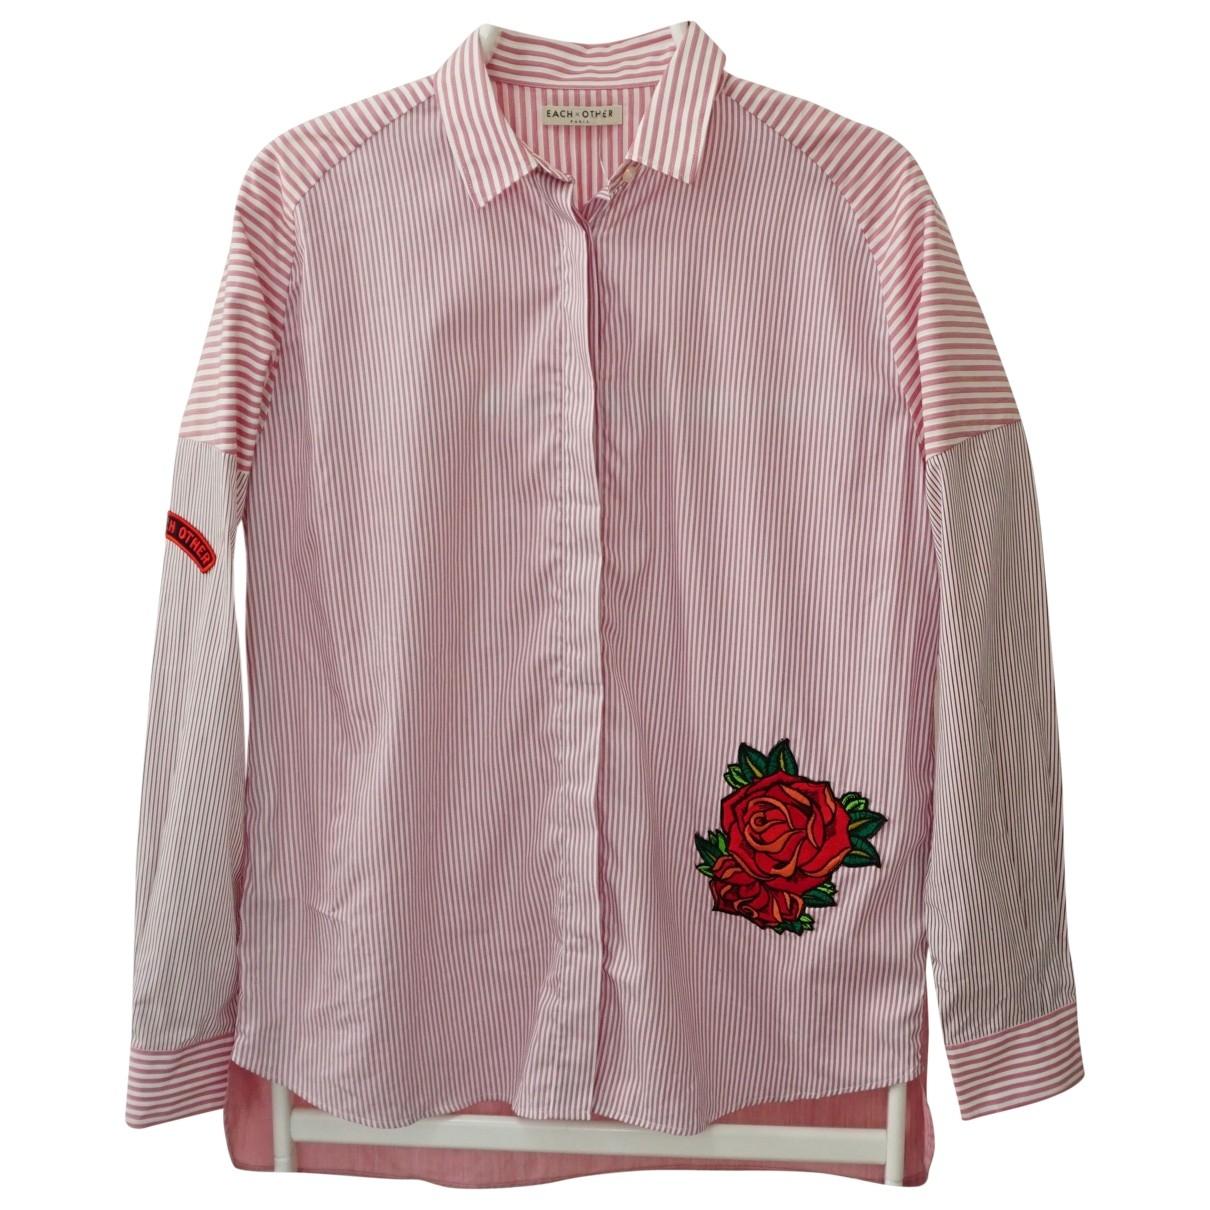 Each X \N Pink Cotton  top for Women S International